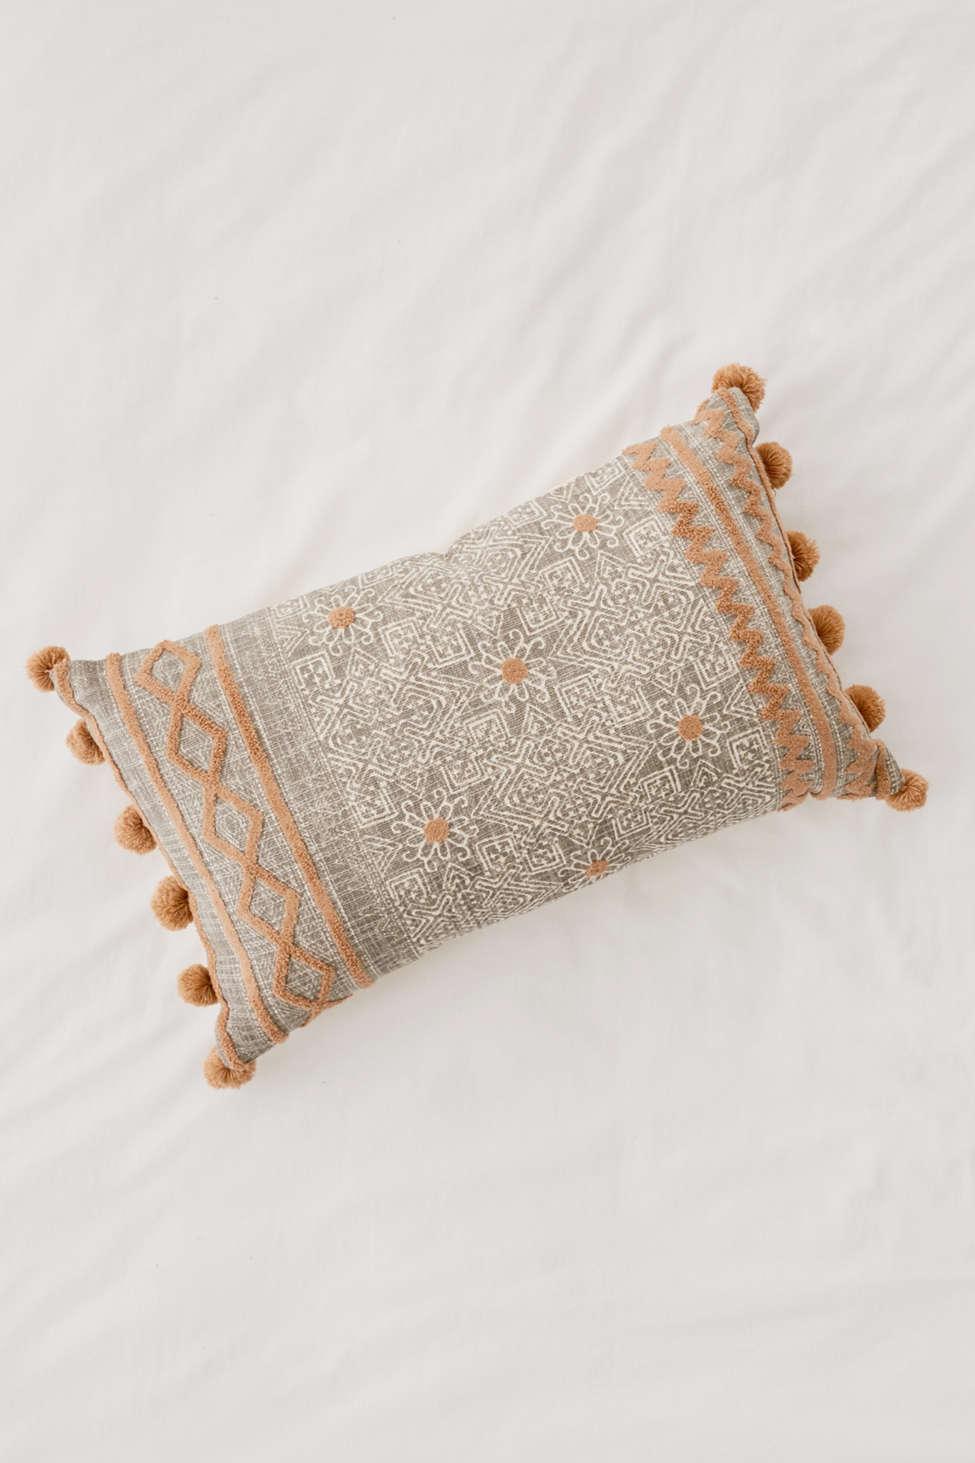 Slide View: 2: Geo Tufted Bolster Pillow